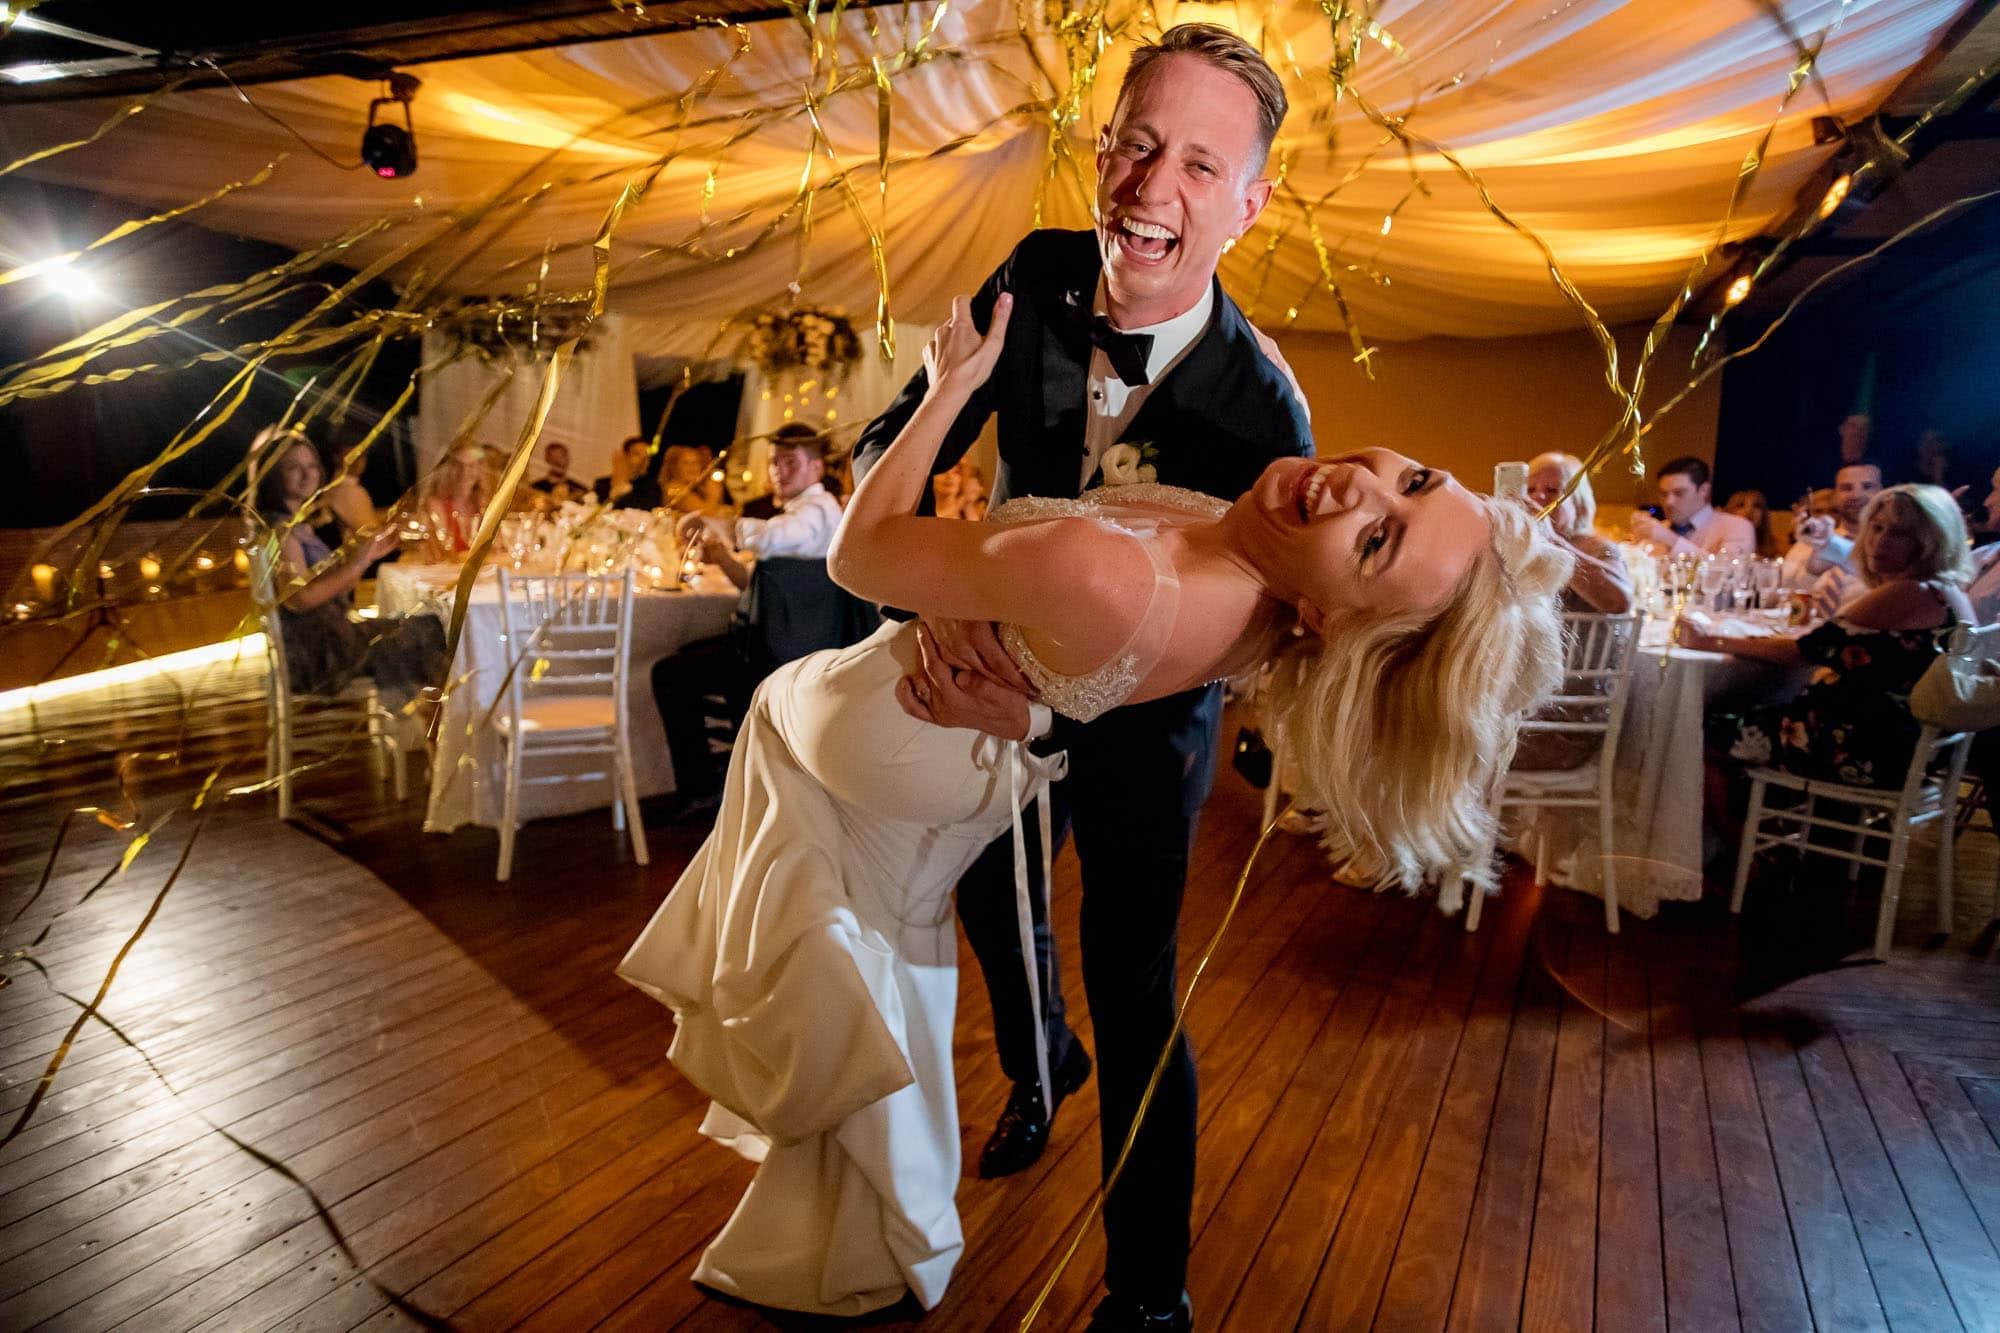 A unique wedding dance from a unique angle